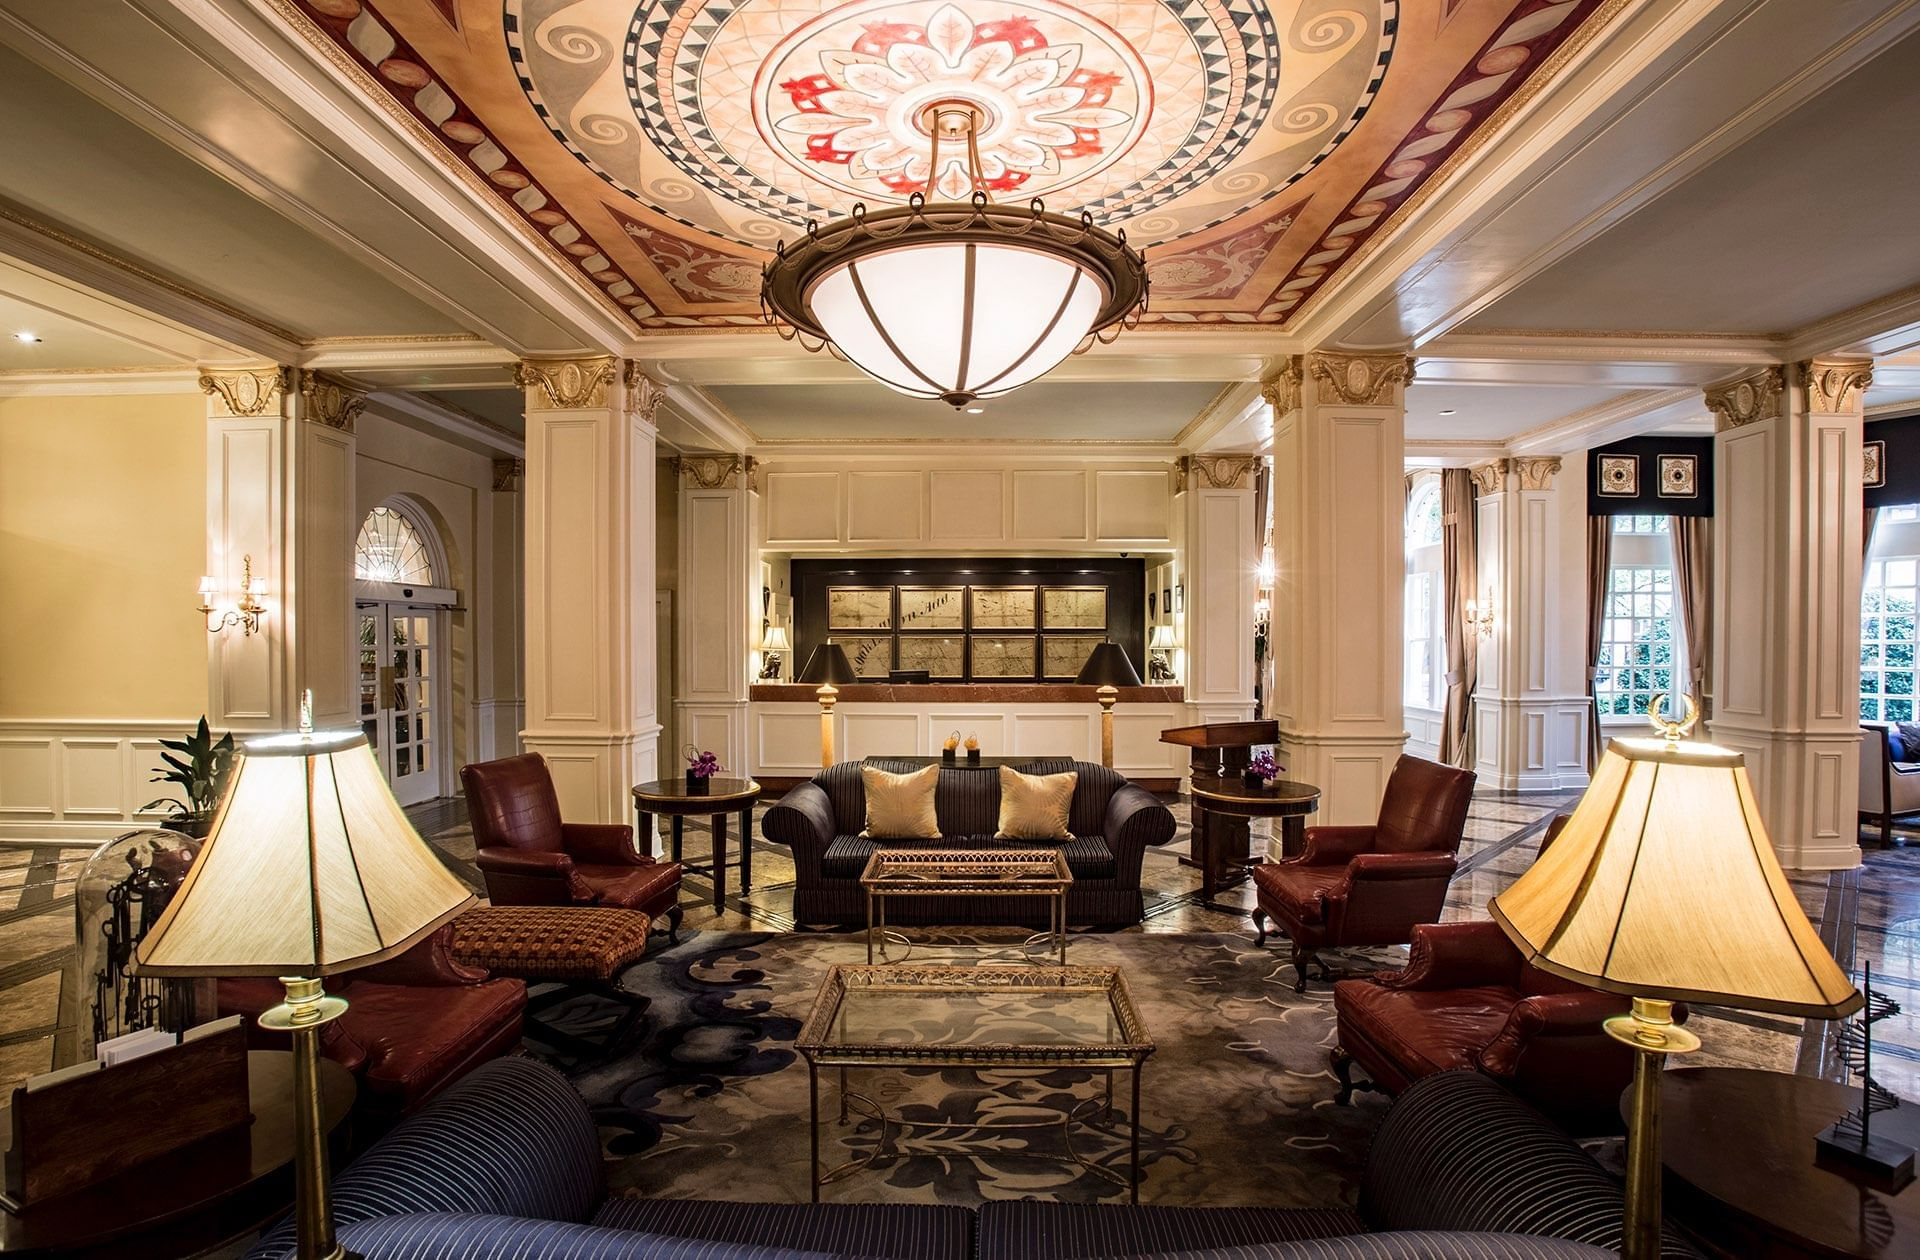 Warwick Melrose Dallas Lobby